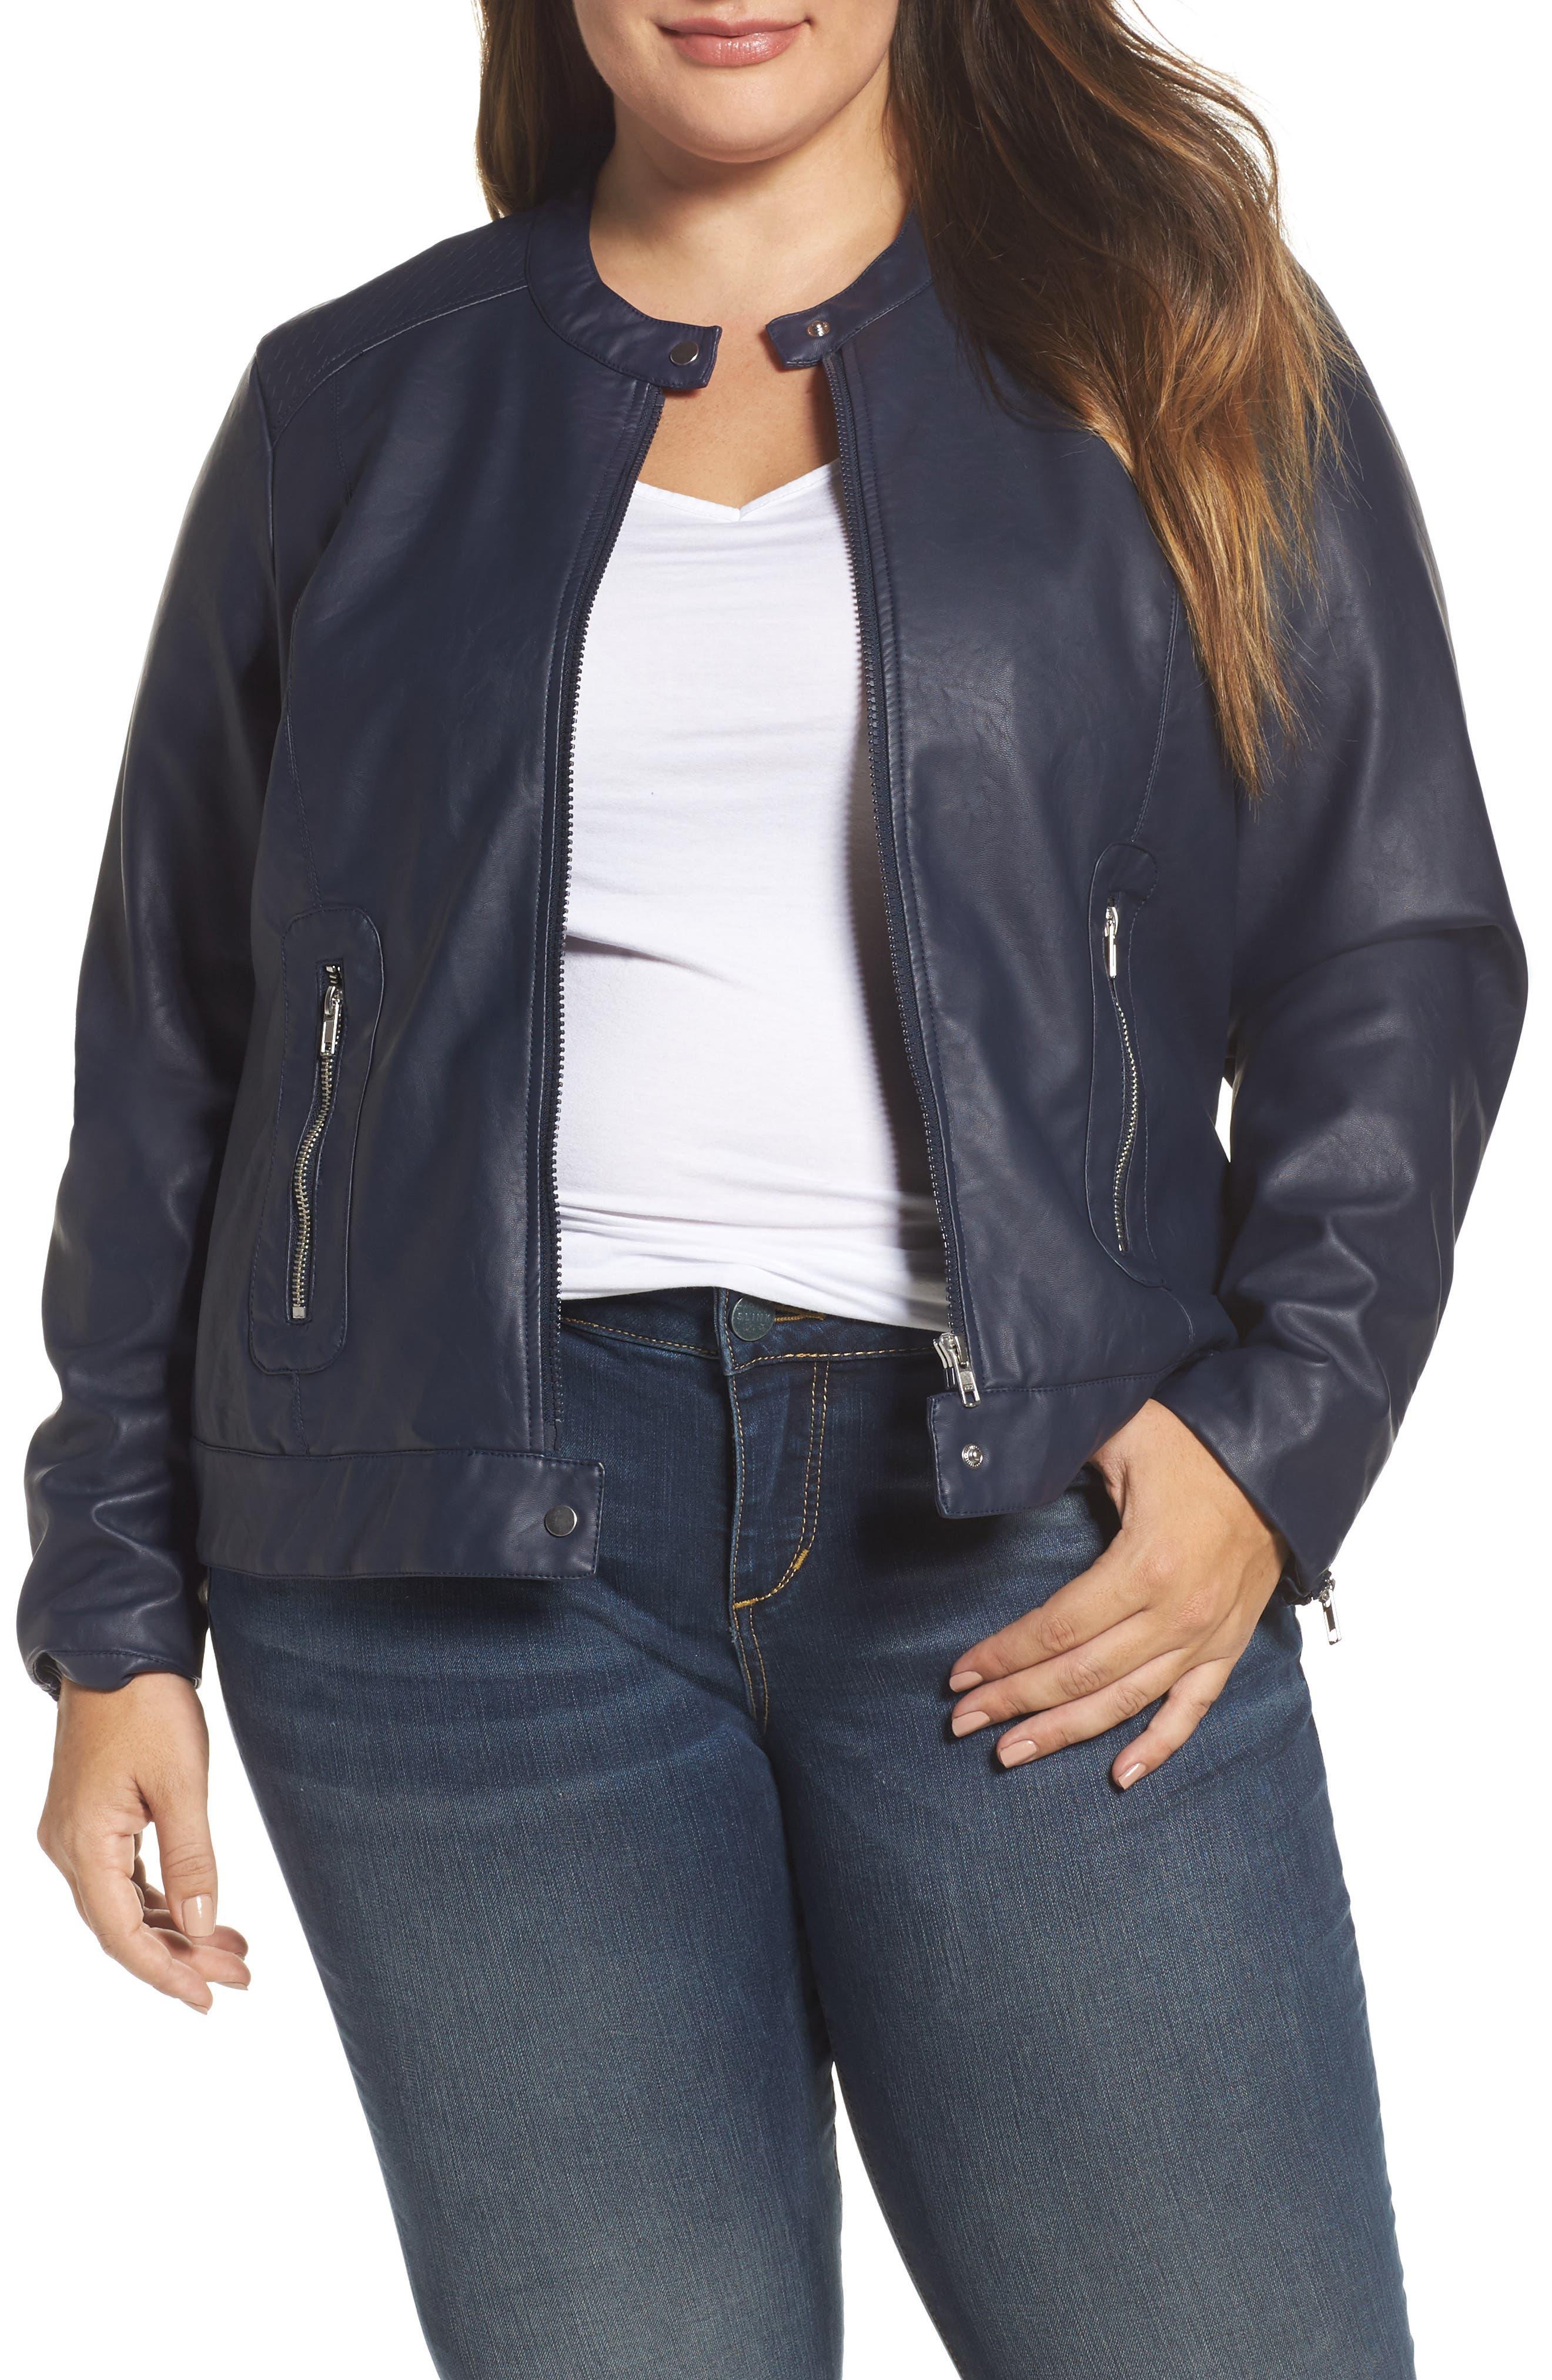 Vava Faux Leather Moto Jacket,                             Main thumbnail 1, color,                             411